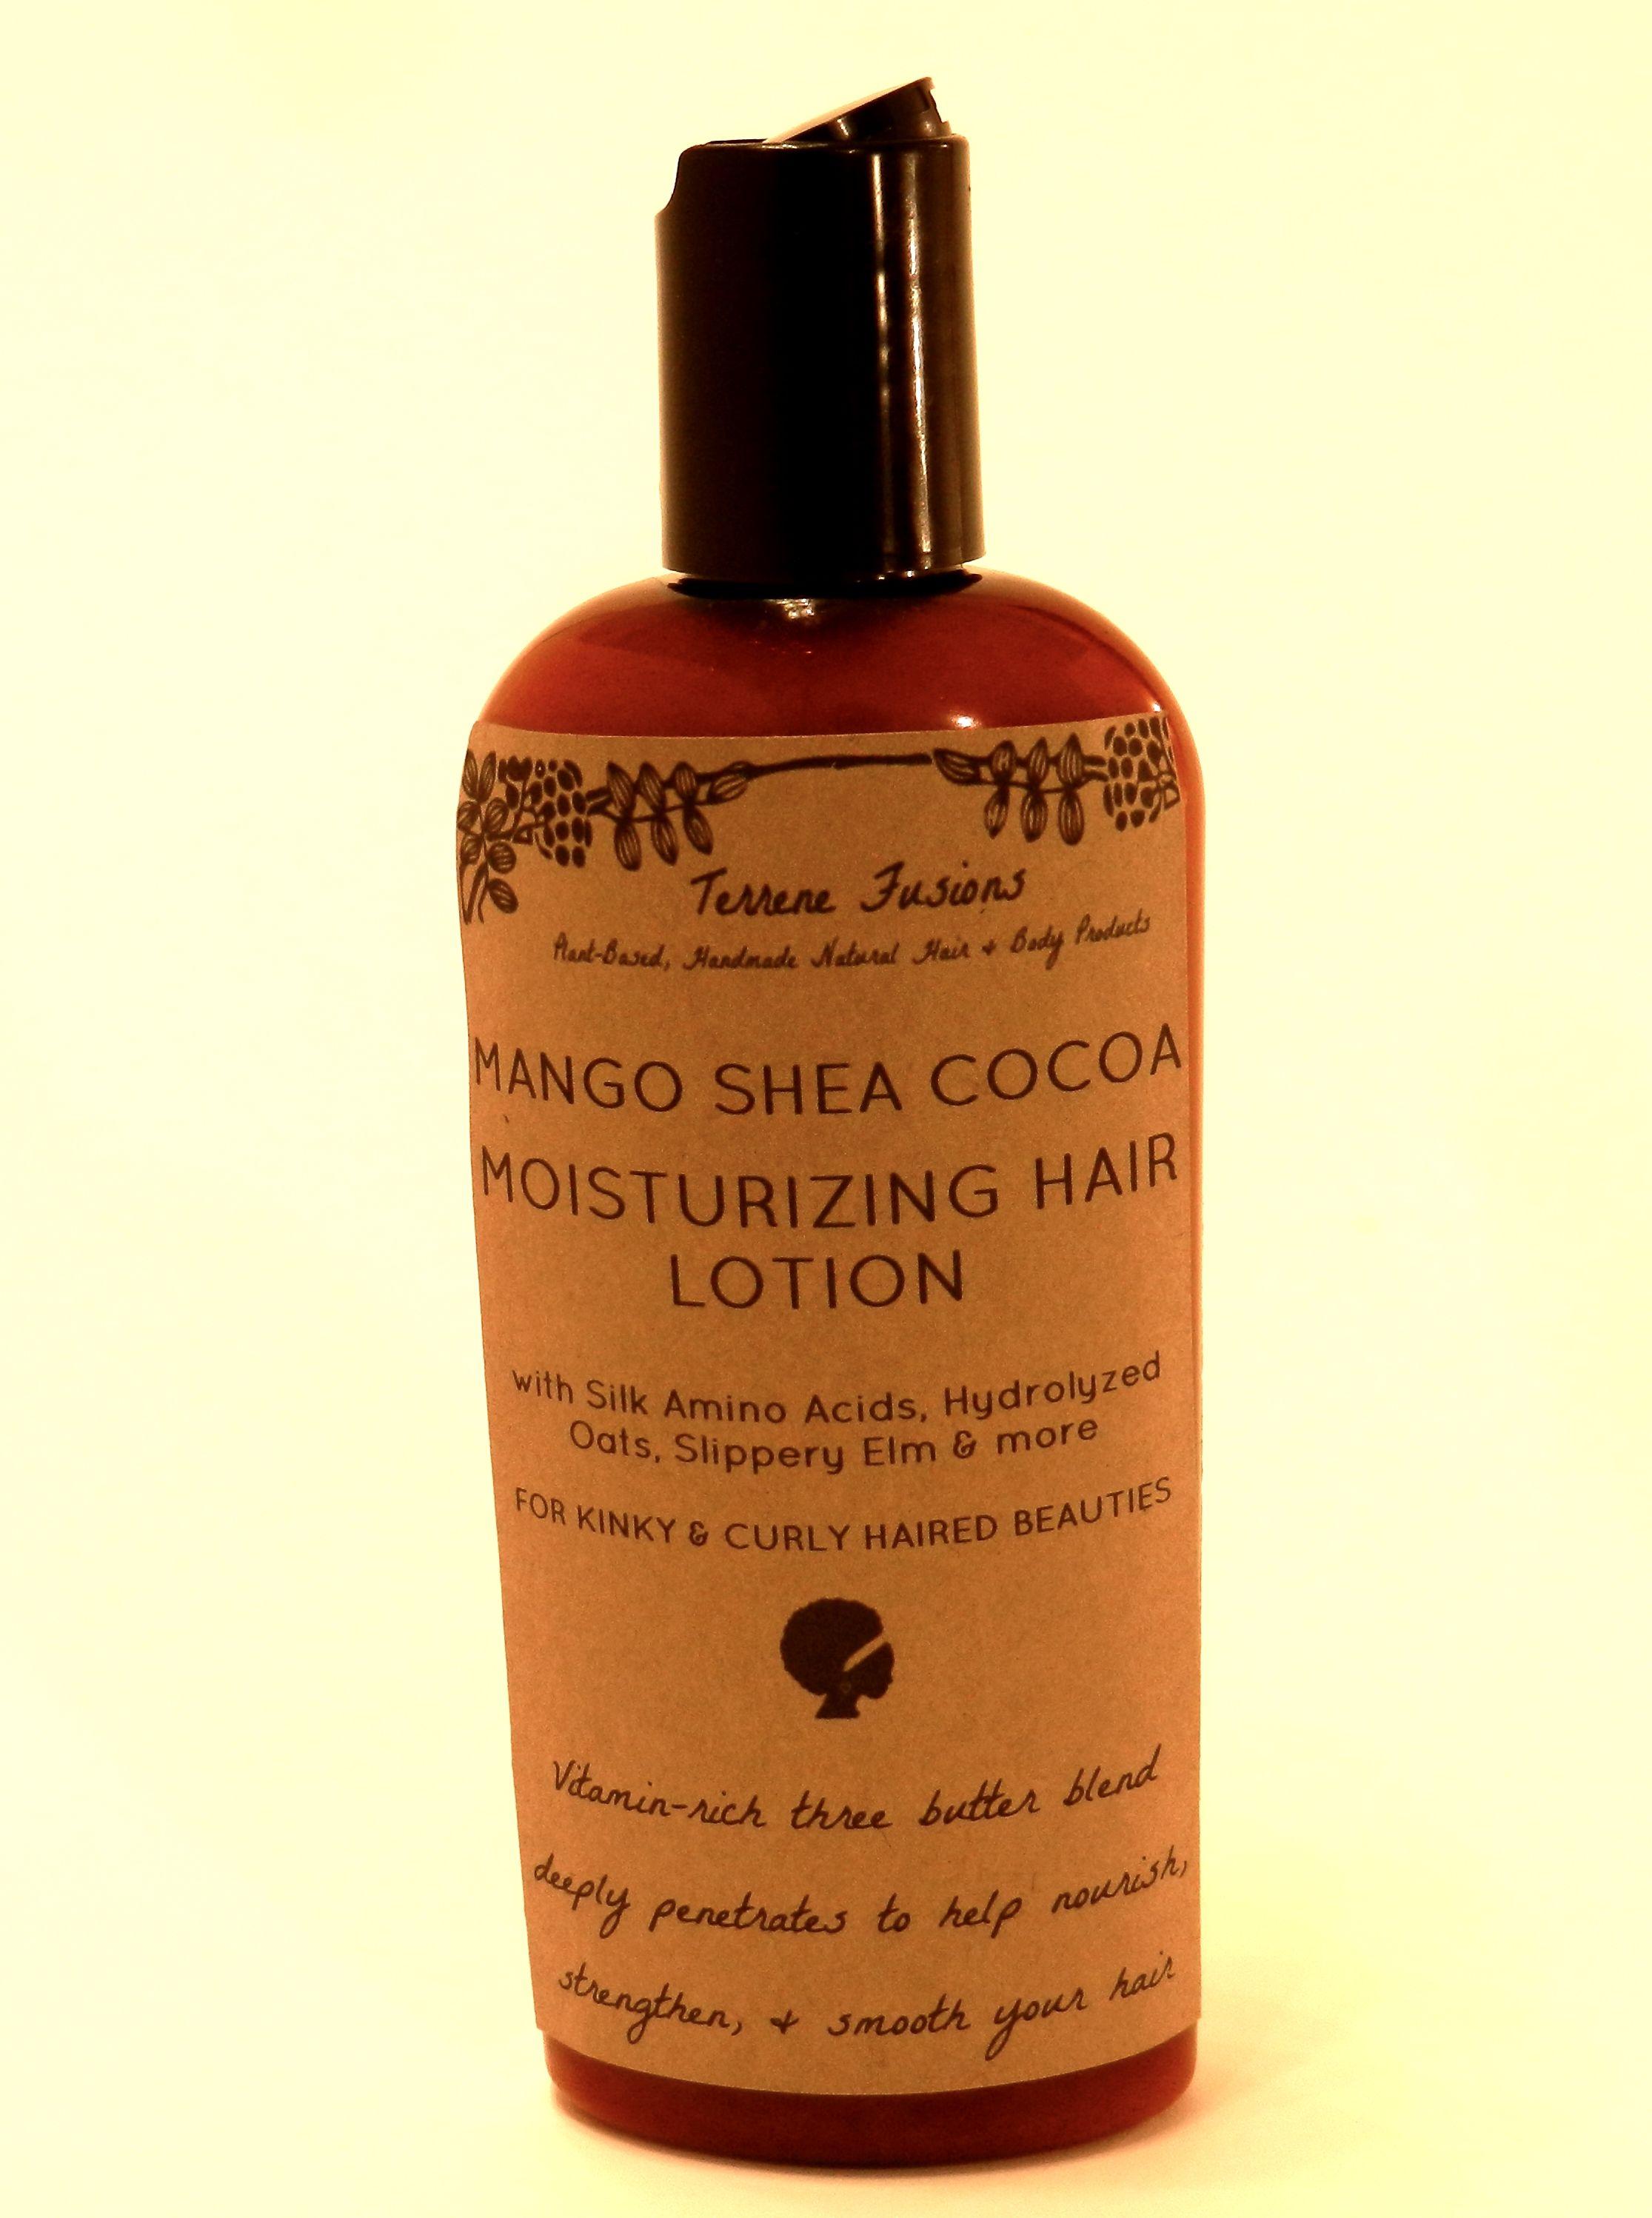 Mango Shea Cocoa Nourishing Hair Lotion With Silk Amino